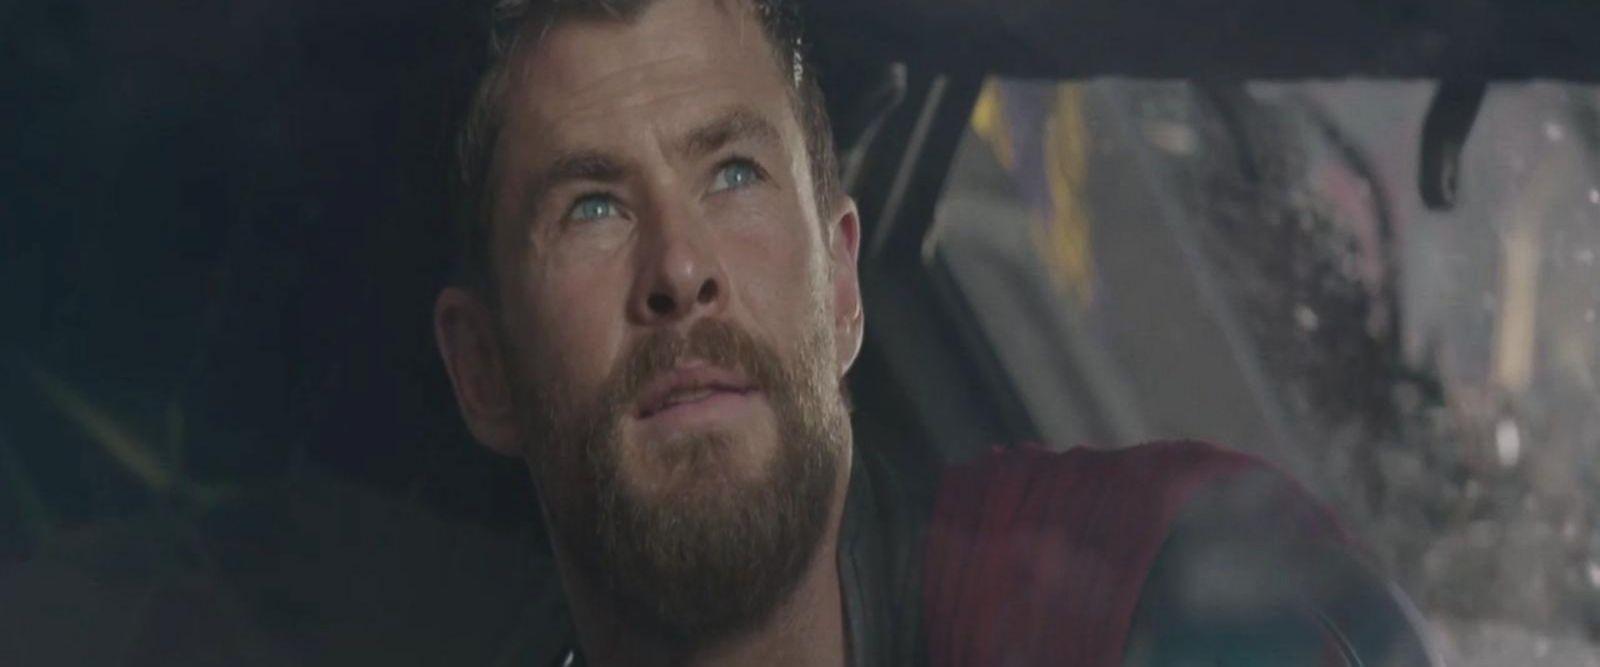 VIDEO: Blockbuster movie reveals at Comic-Con 2017